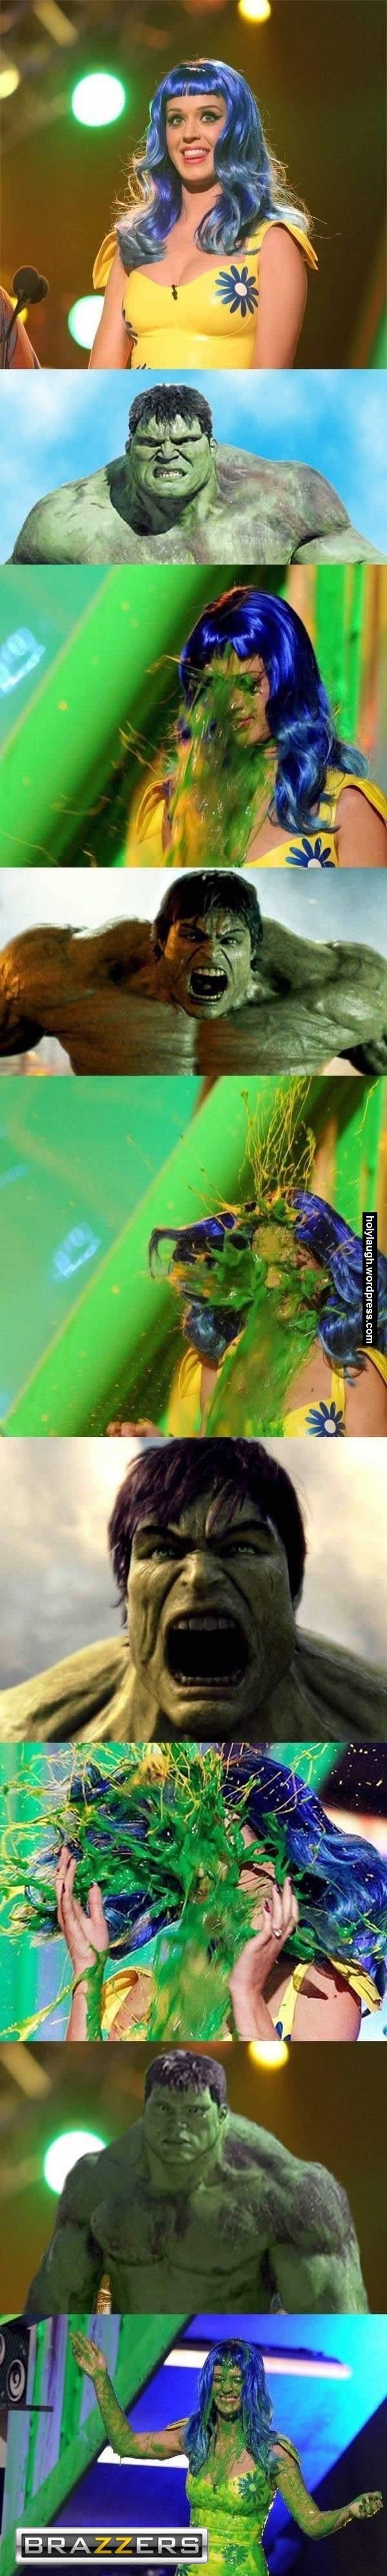 Hulk smash on Katy Perry